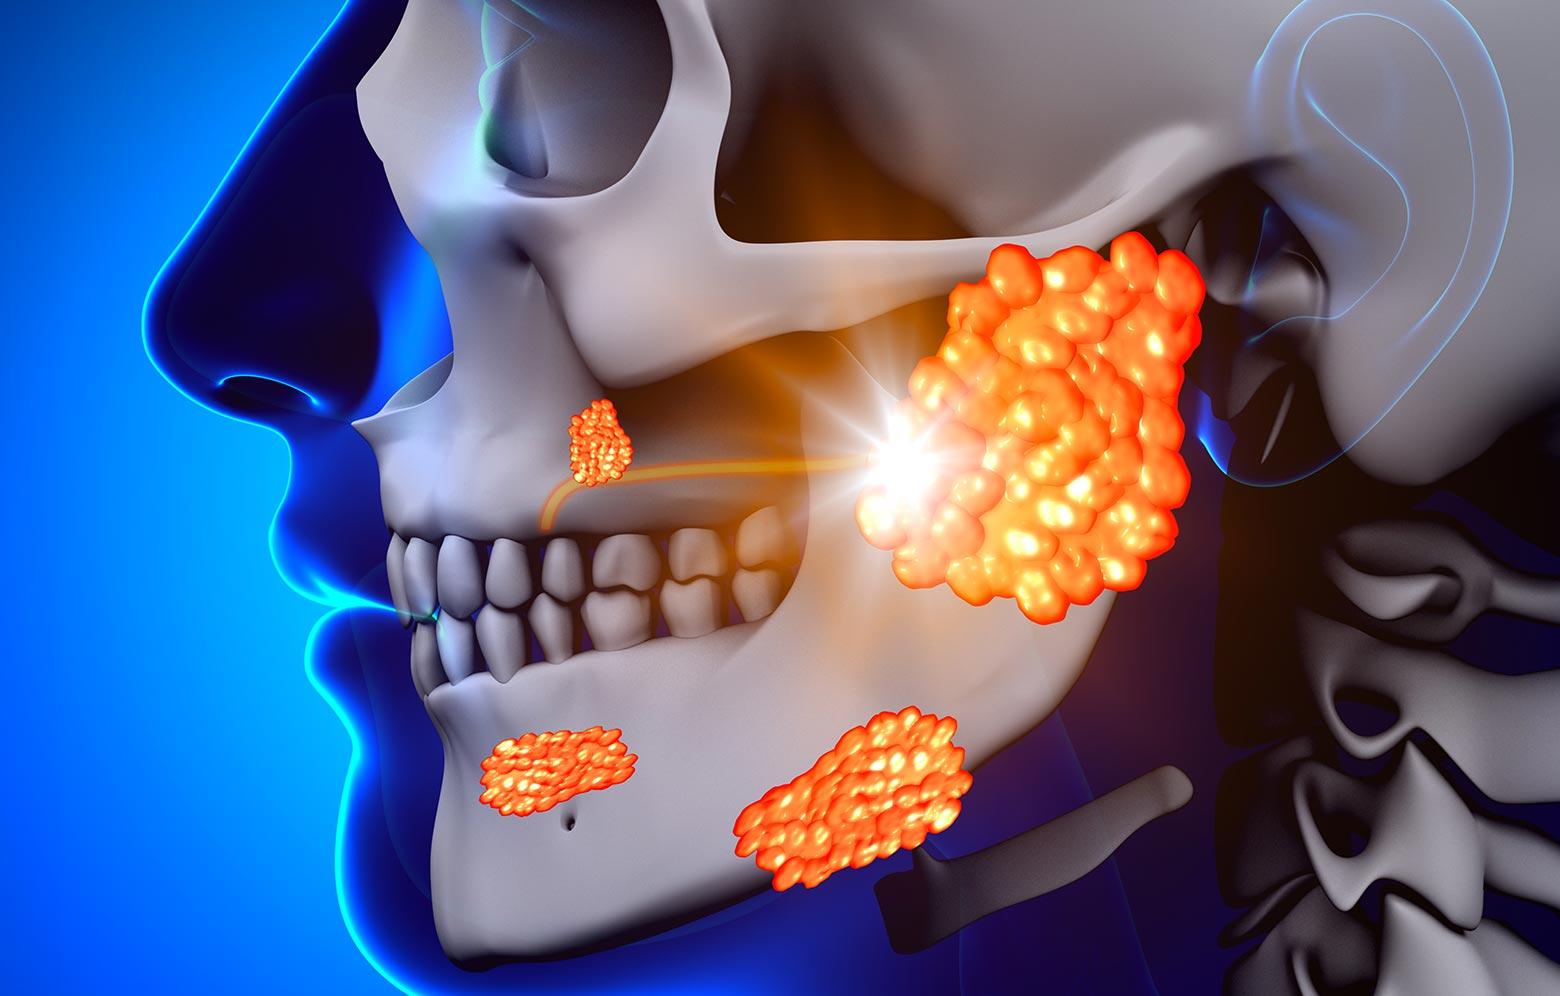 ghiandole salivari tumore